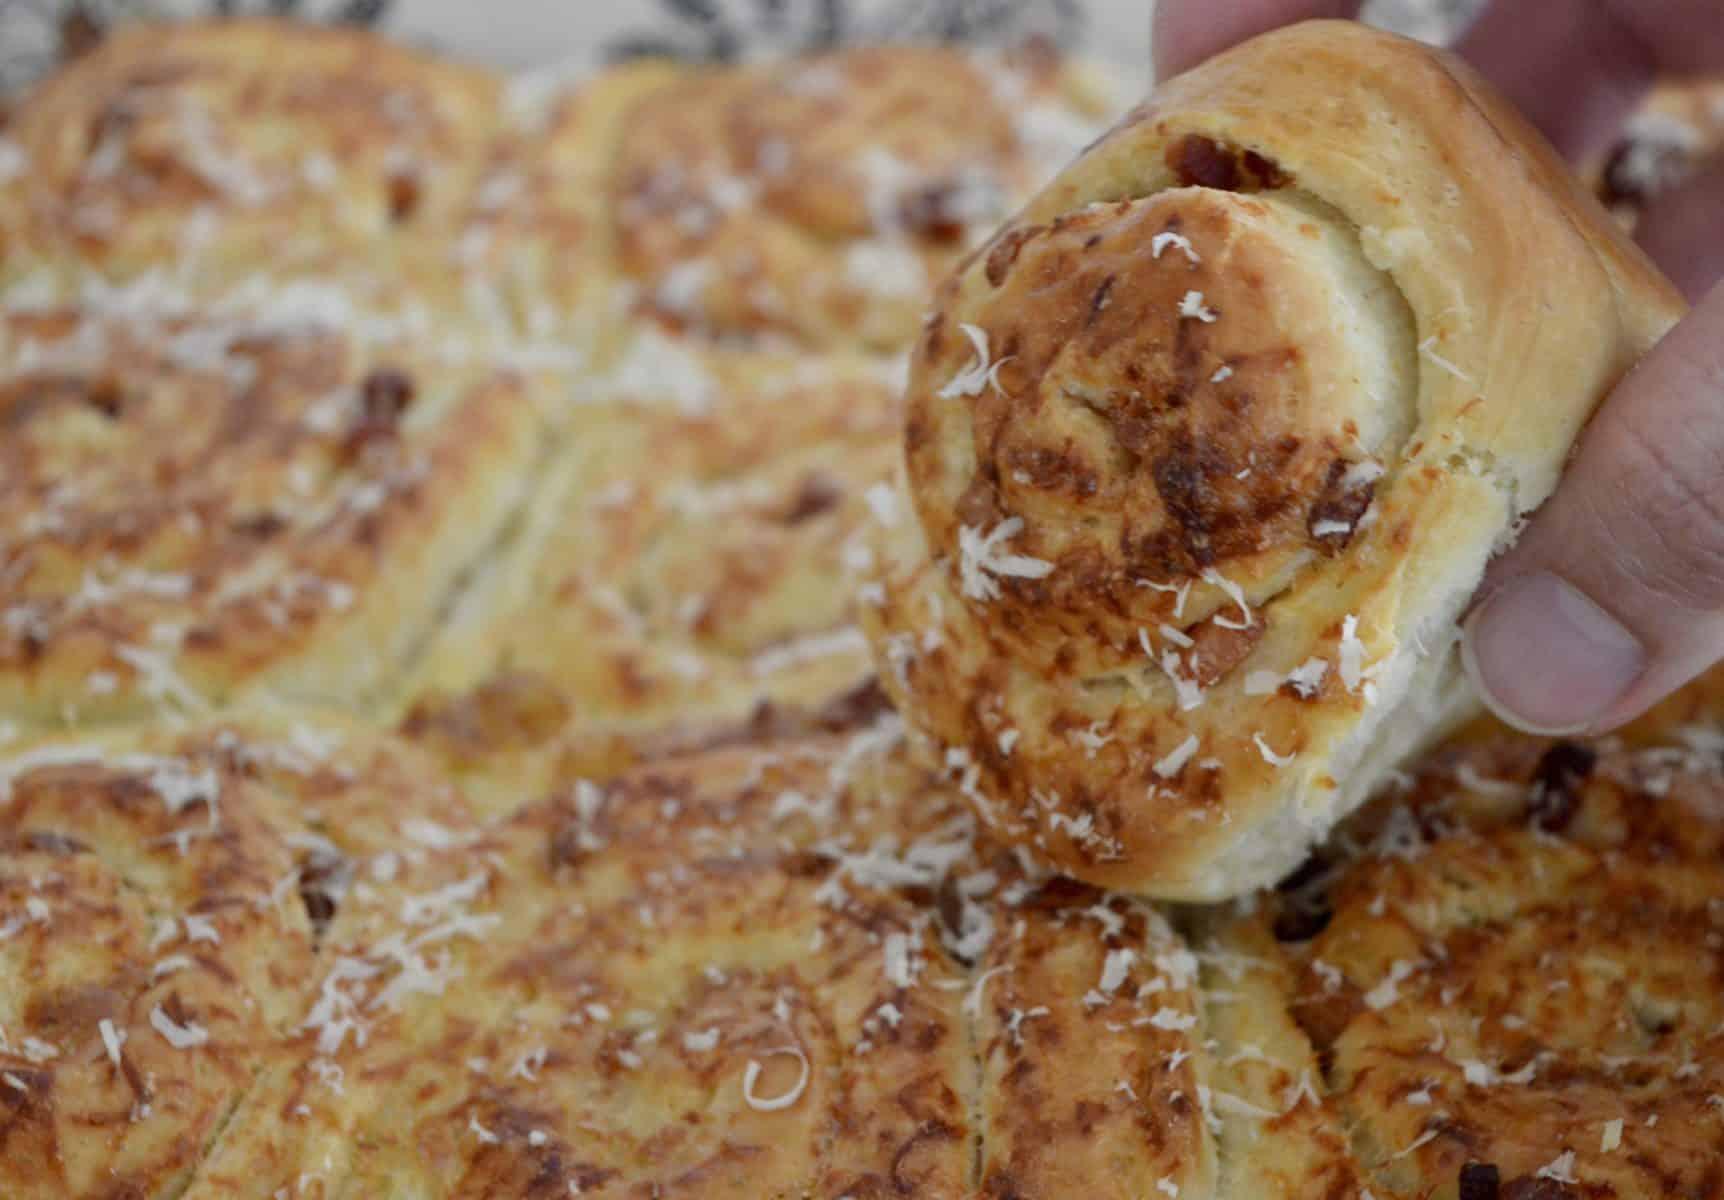 bacon and parmesan pinwheel bread rolls.